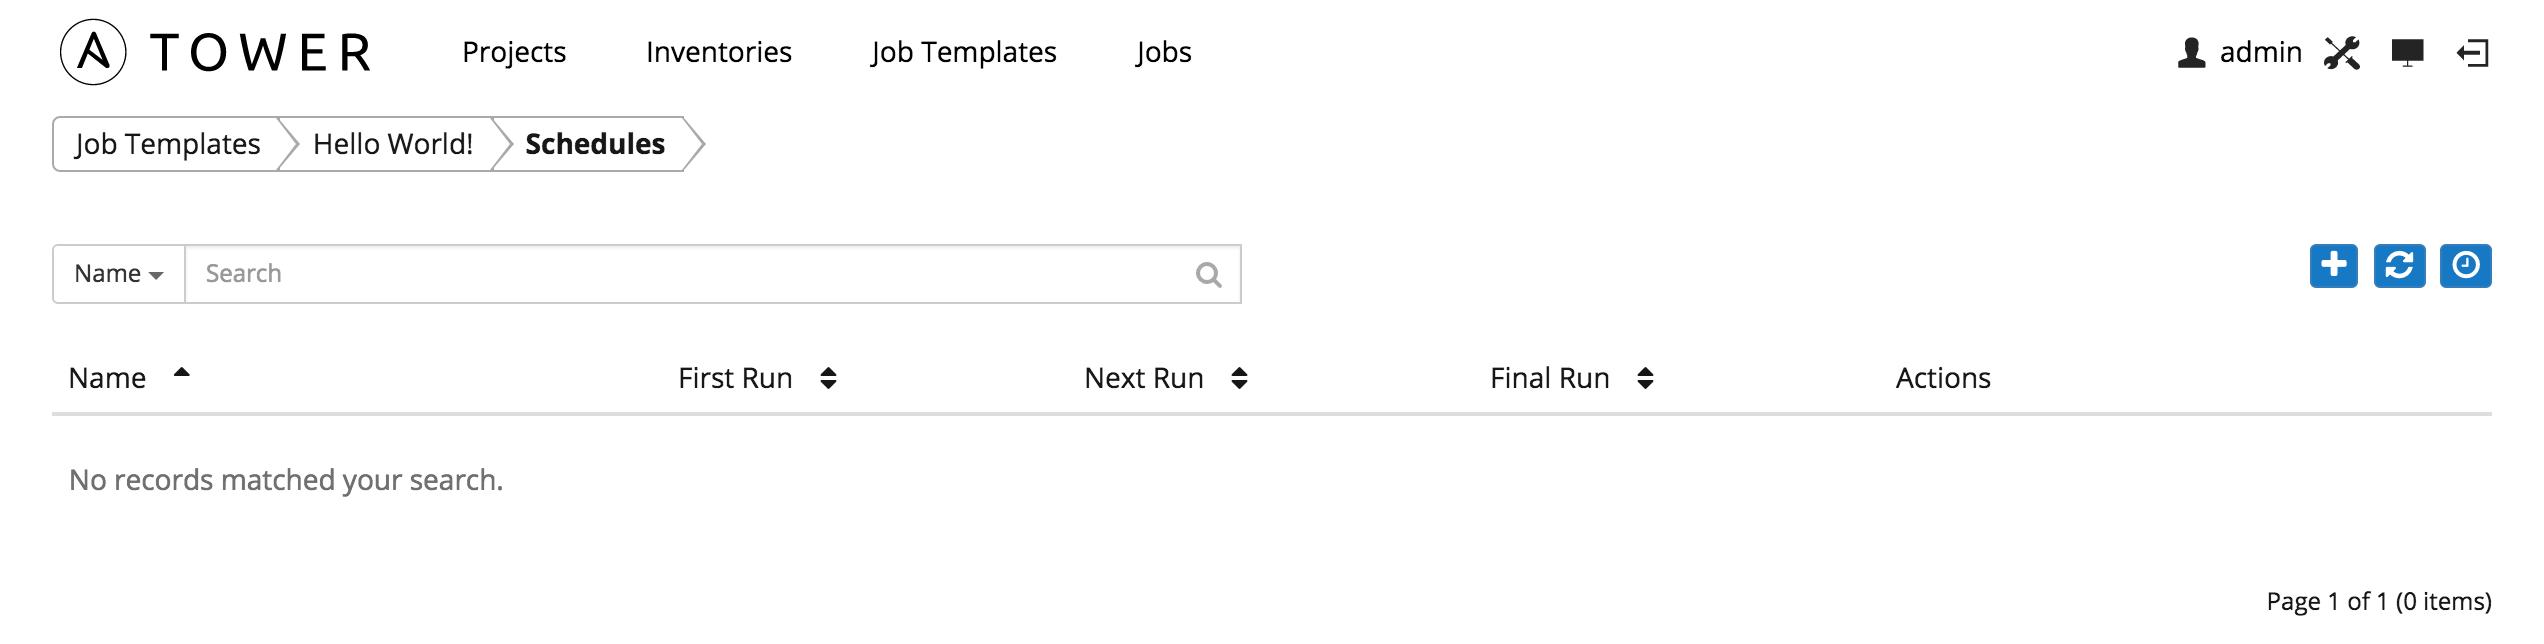 11 job templates ansible tower user guide v245 job templates schedule launch maxwellsz